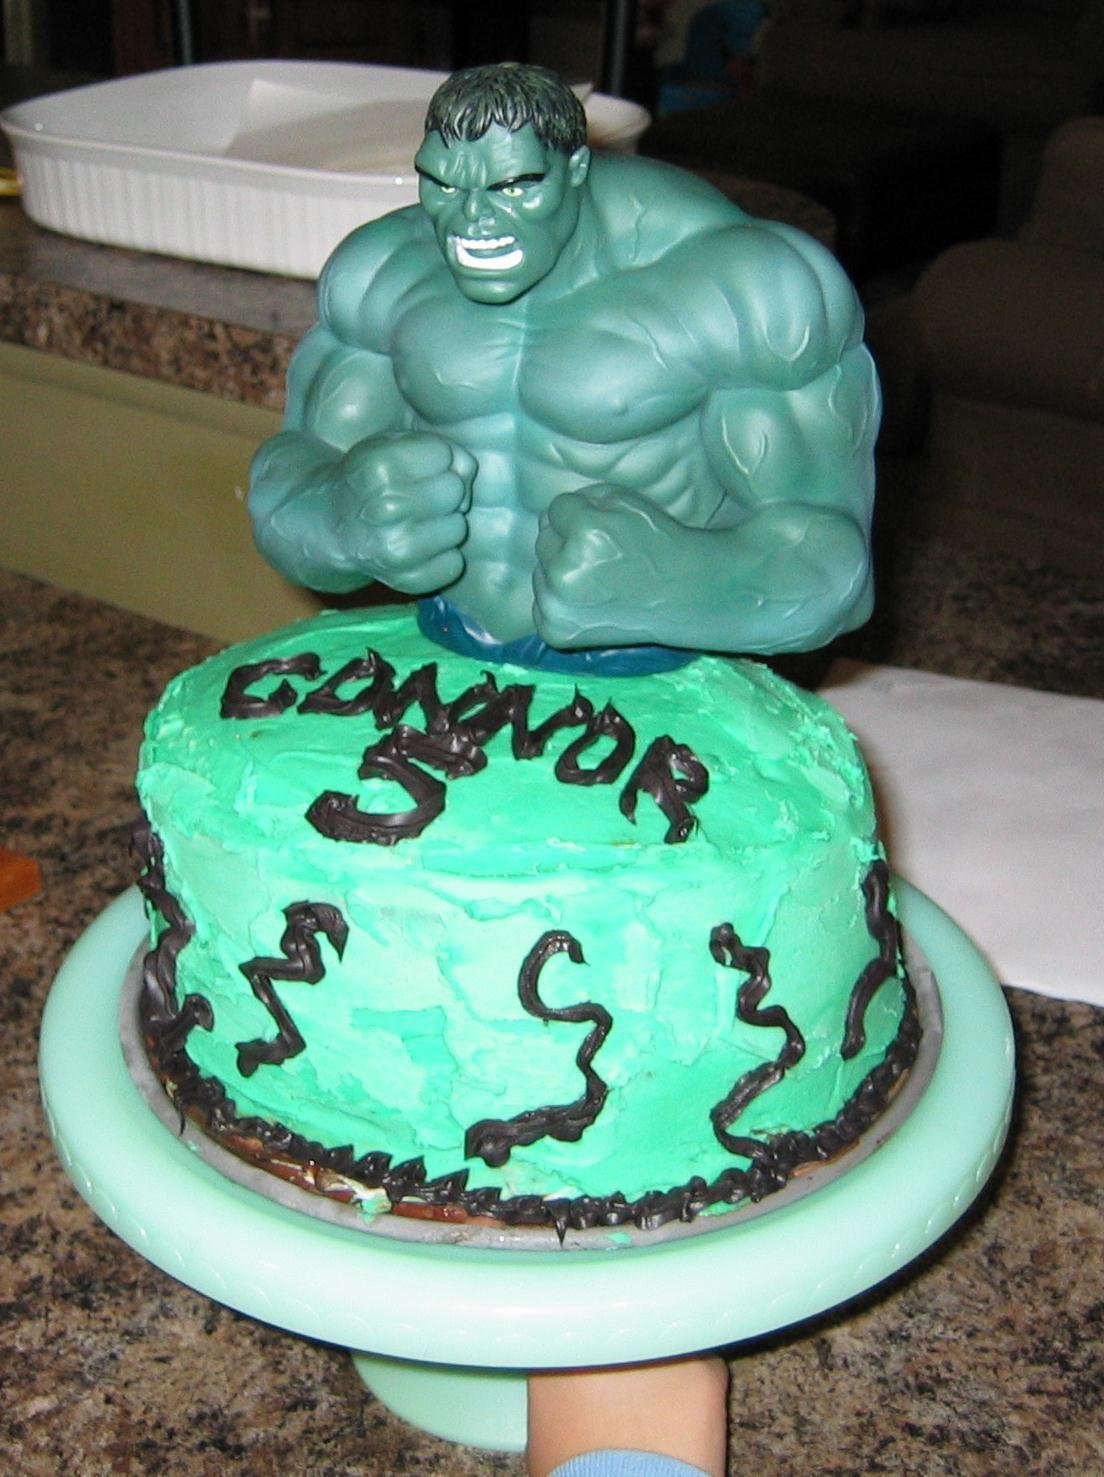 Incredible Hulk Cake Birthday parties Pinterest